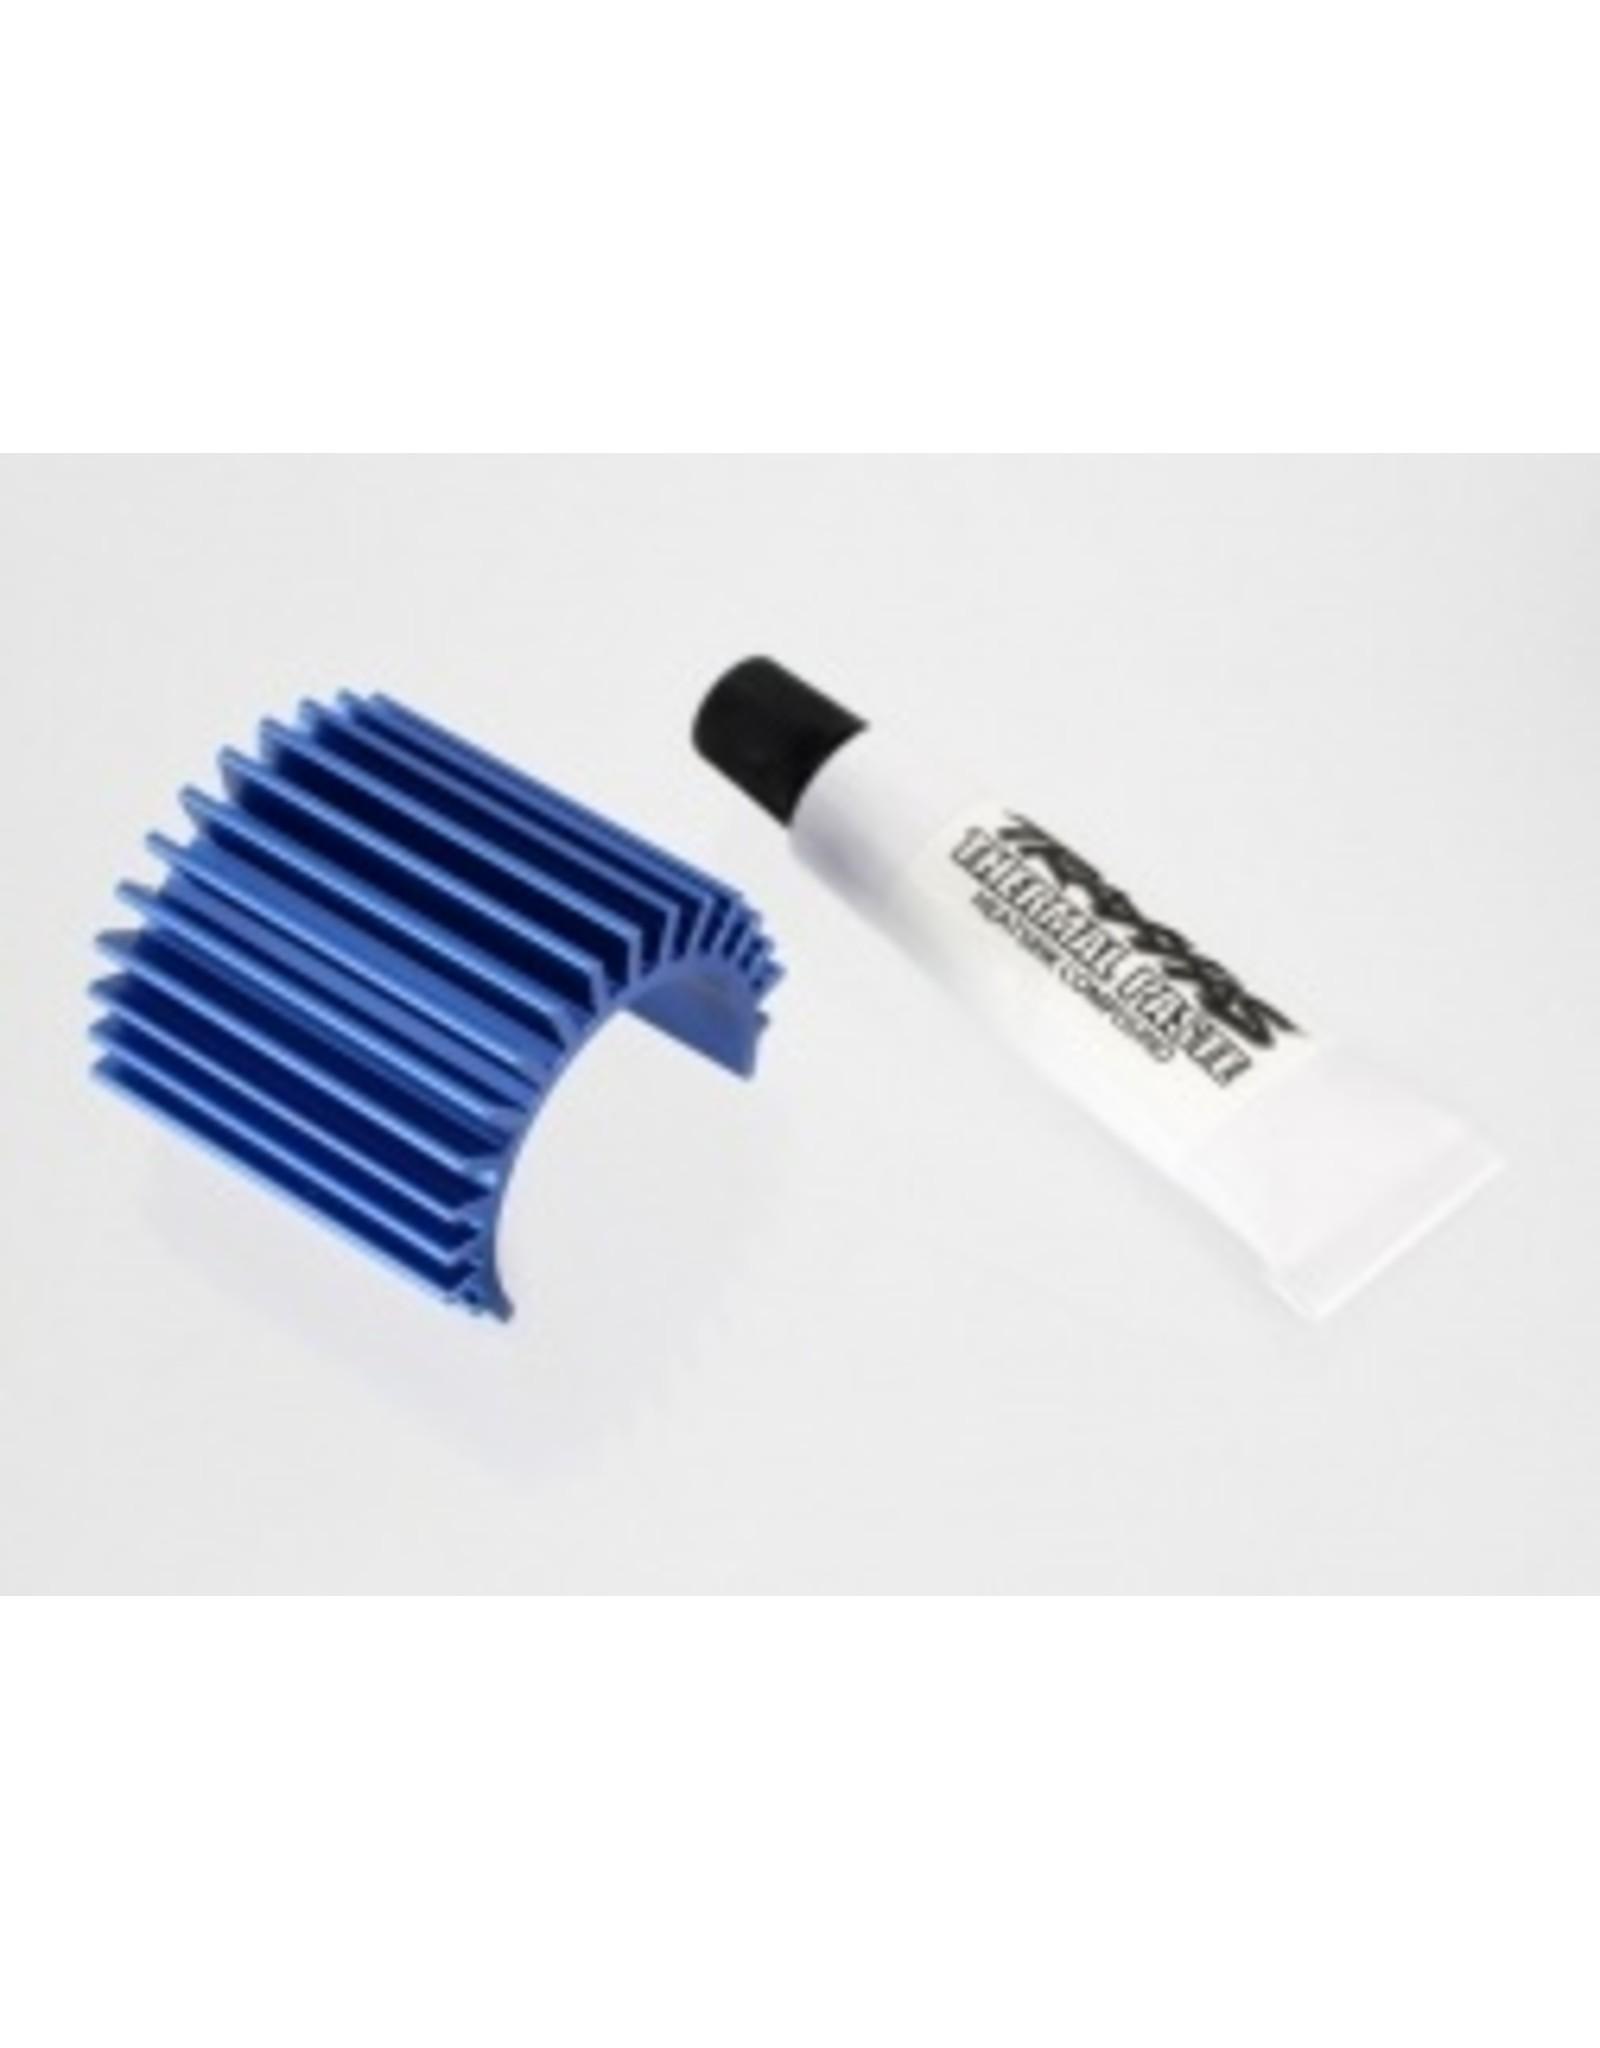 Traxxas Aluminum Heat Sink, Blue: 1/16 VXL Models  (TRA3374)